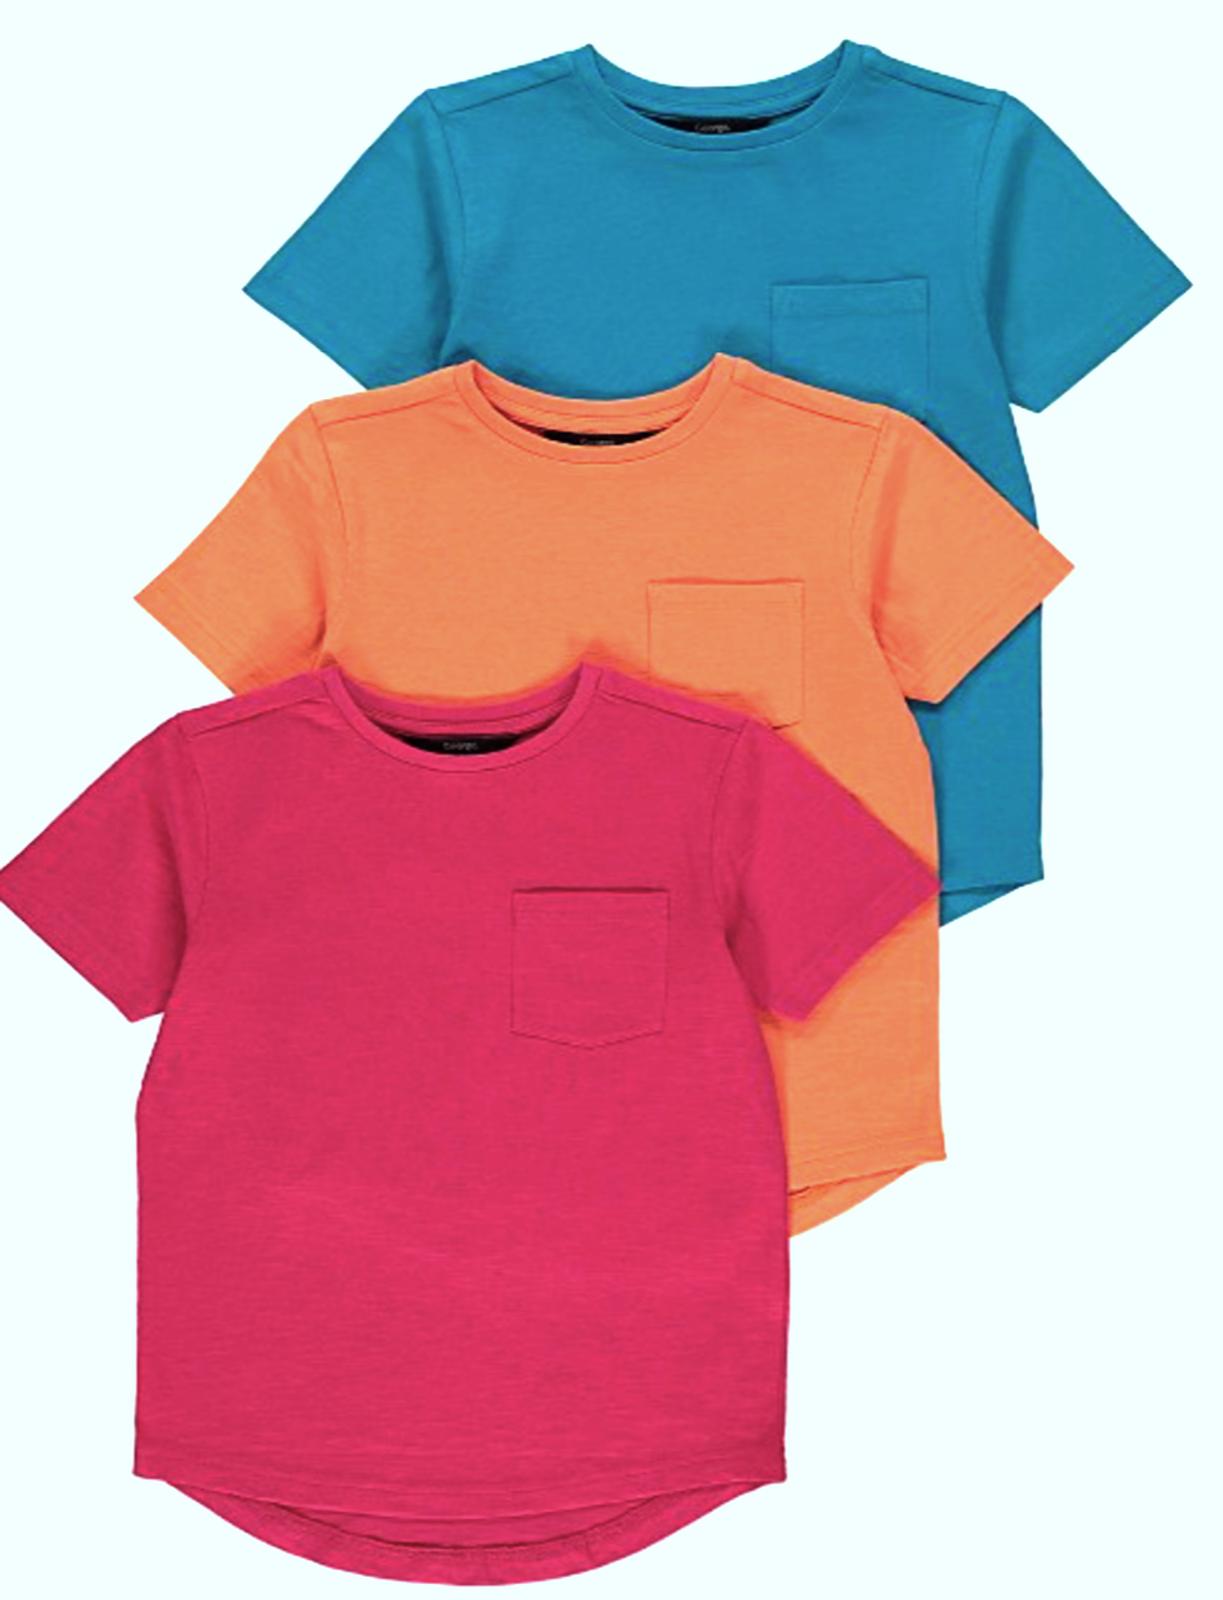 Kids Boys/Girls Unisex Crew Neck Short Sleeves T-Shirt Top 100% Cotton 5 to10YRS 3